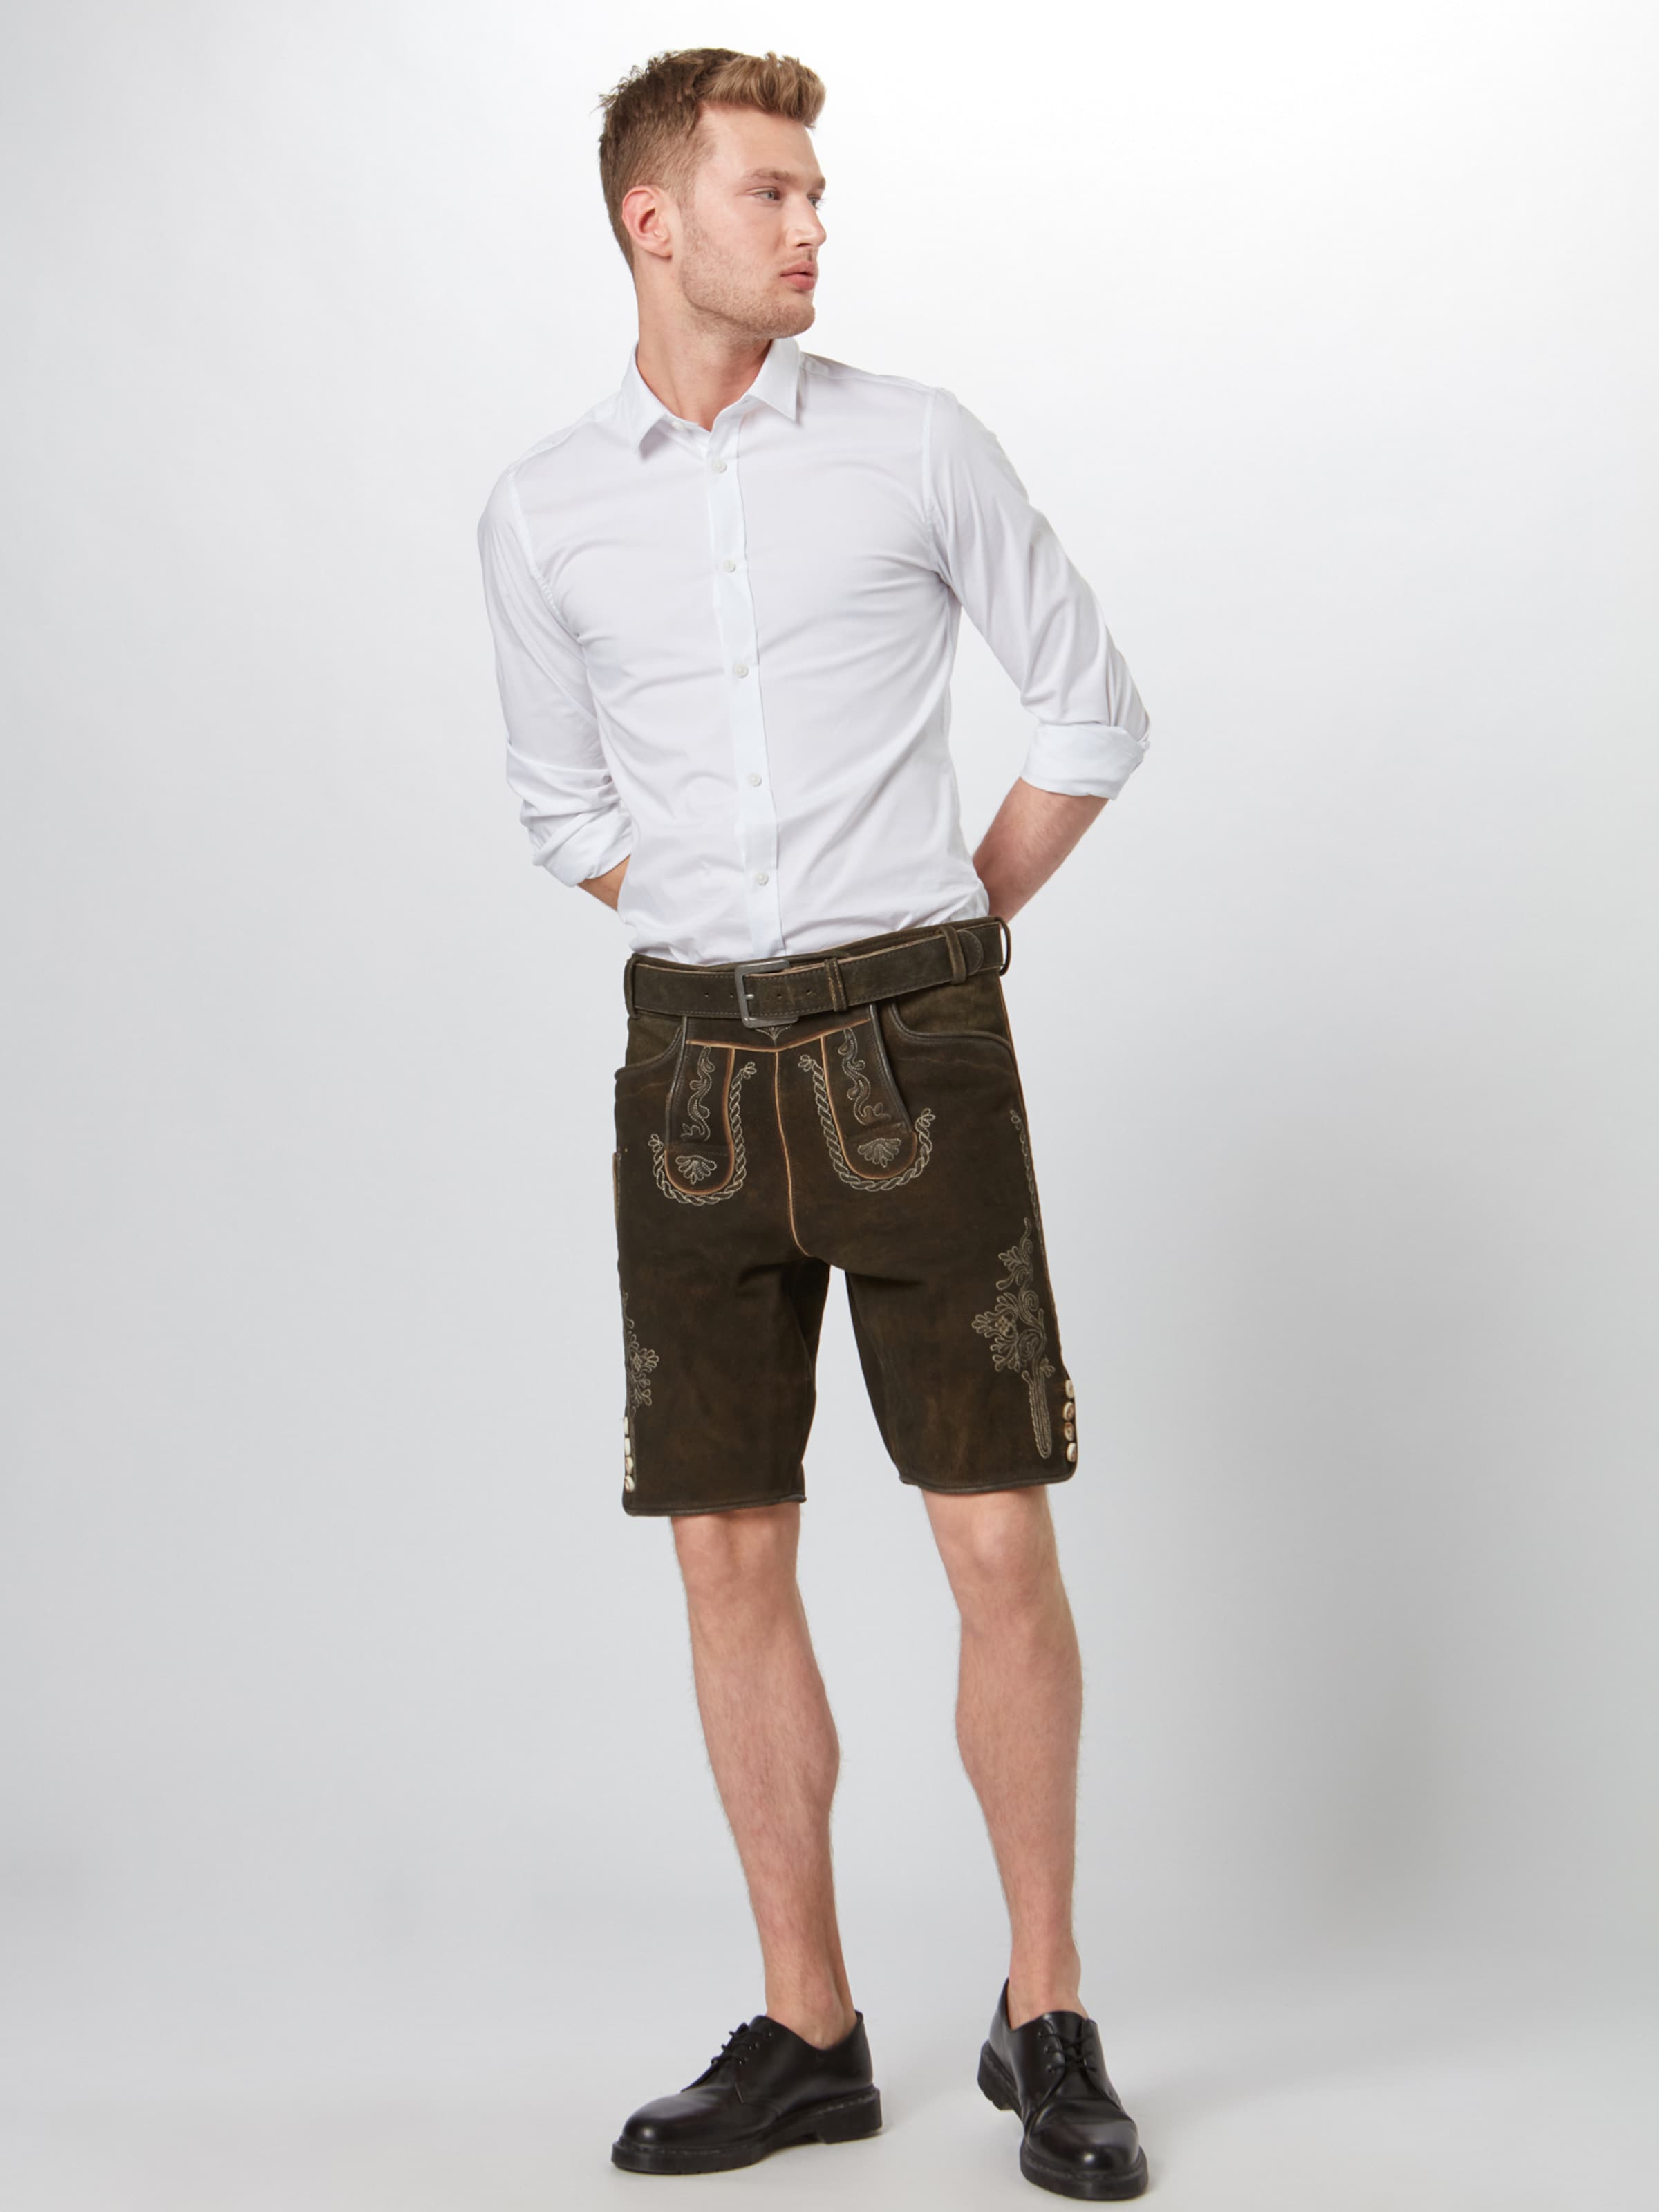 Ii' En 'schorsch Foncé Brun Marjo Folklorique Pantalon Nm0O8vnw